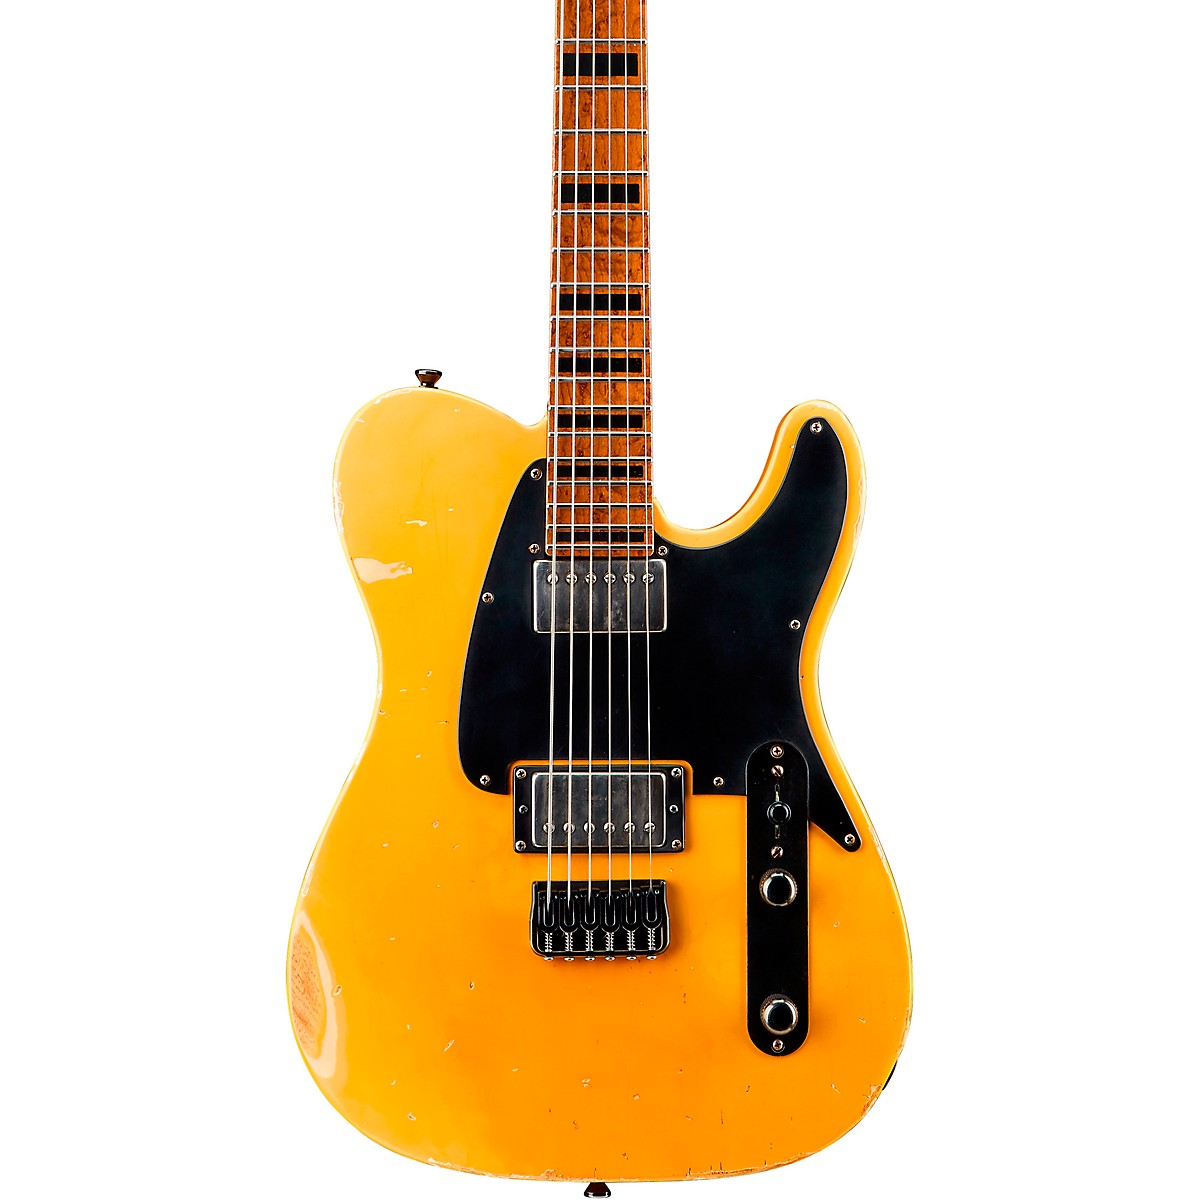 LsL Instruments Adam Christianson Signature Baritone Electric Guitar